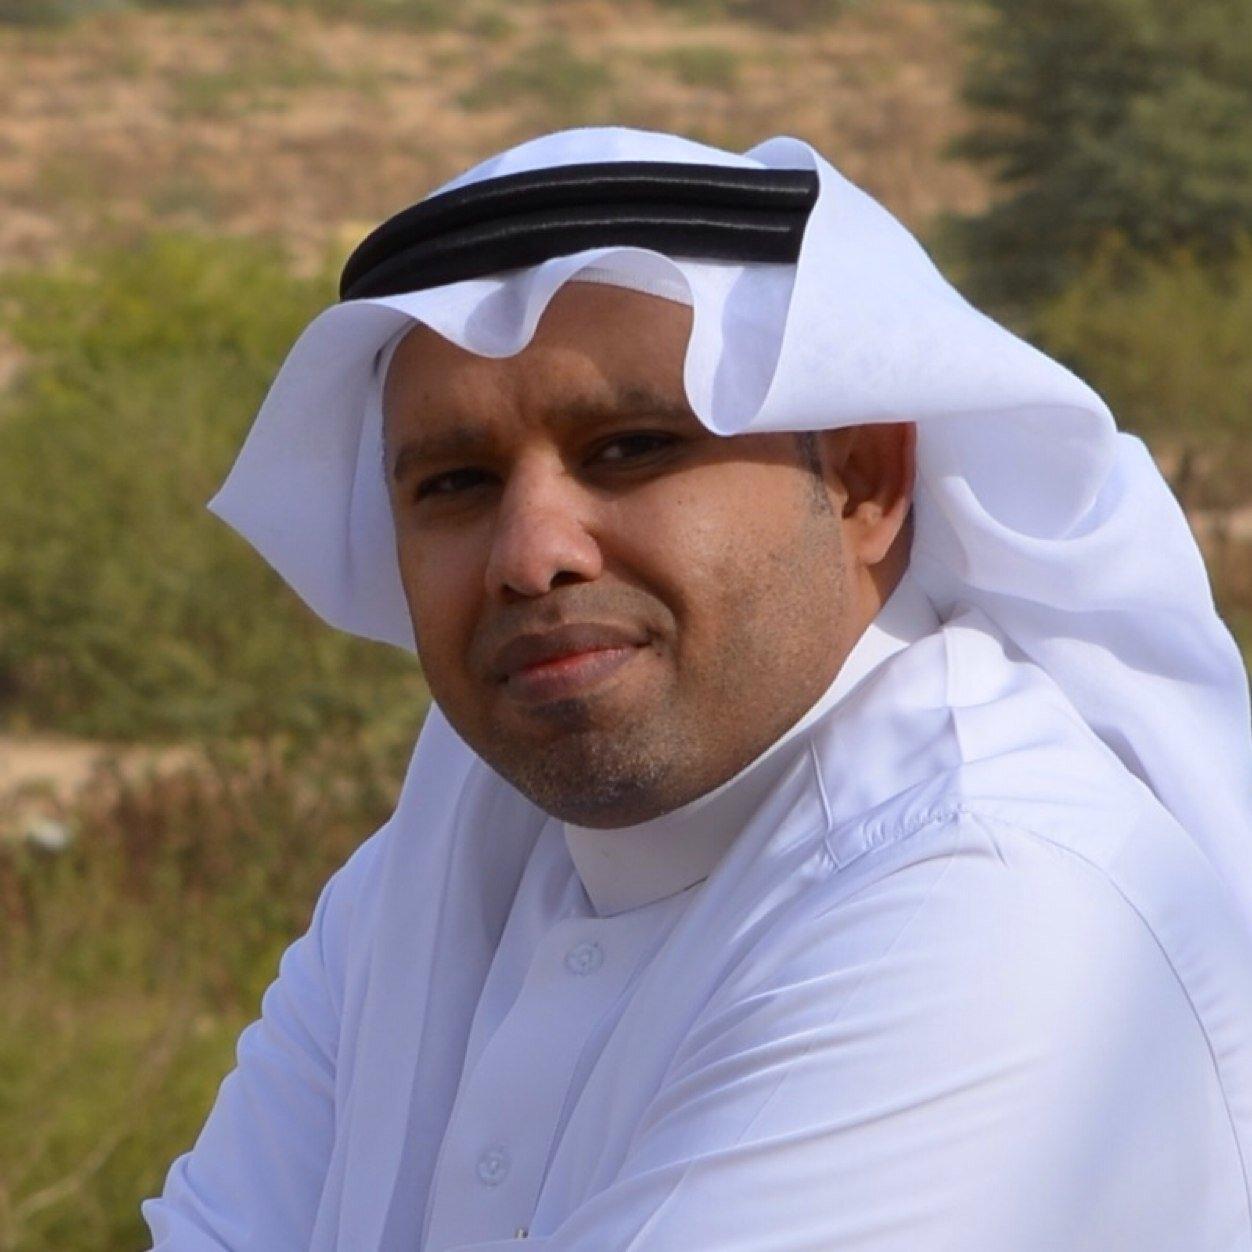 خالد الرفاعي (@khalidrefaei) | Twitter intended for Jr Dl Ohg Hgvthud 1439